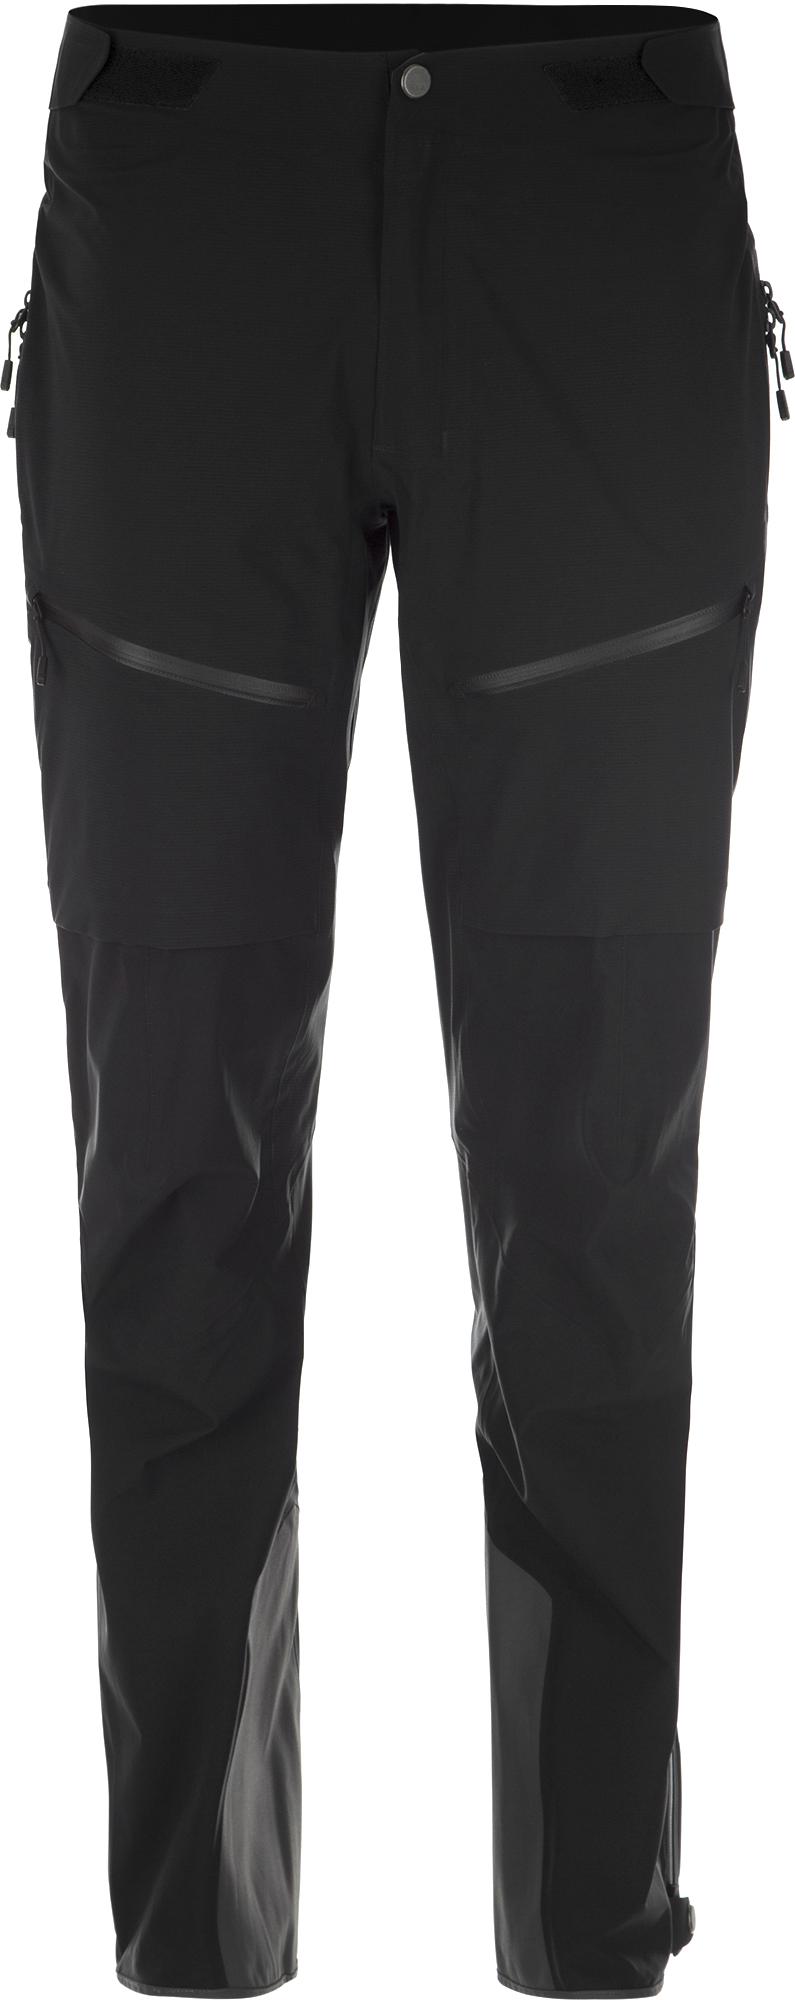 Брюки утепленные мужские Mountain Hardwear Superforma, размер 48 mountain hardwear брюки мужские mountain hardwear exposure 2™ gore tex paclite® stretch размер 48